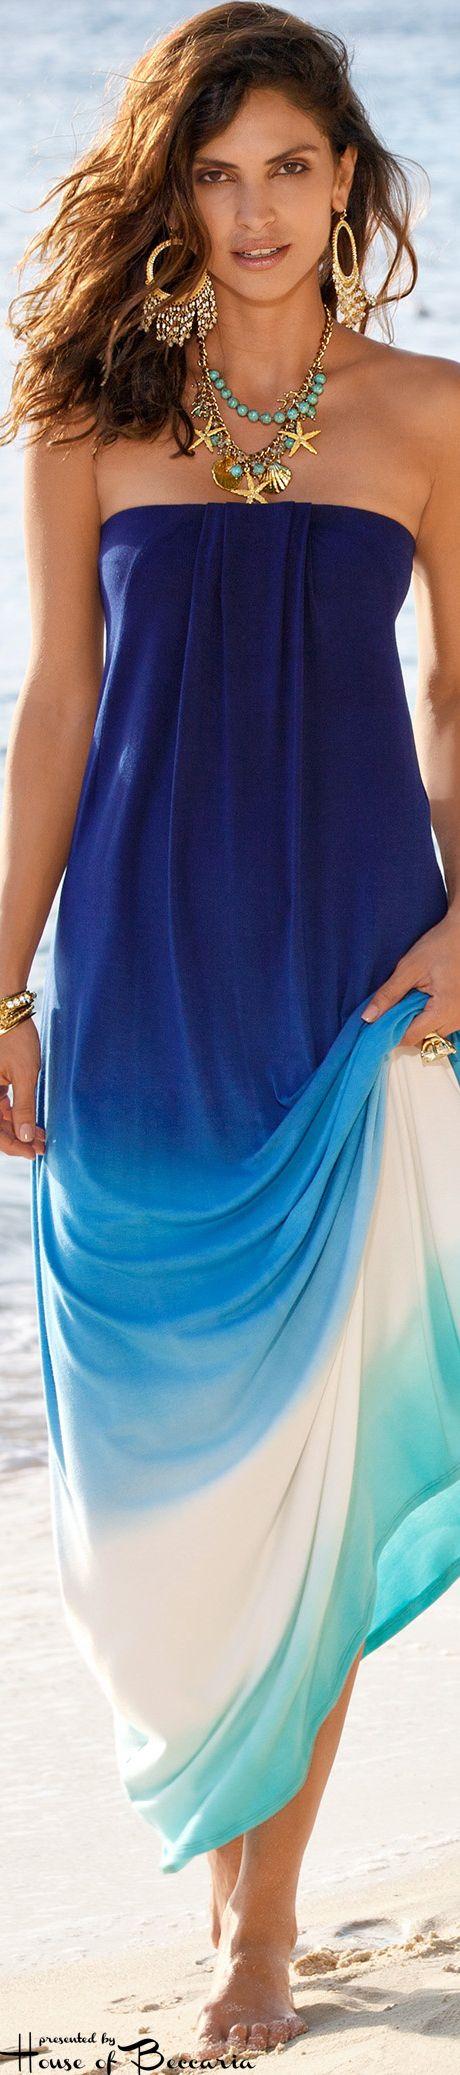 17 Best images about Beach Dresses on Pinterest   Stella dot, Shops ...